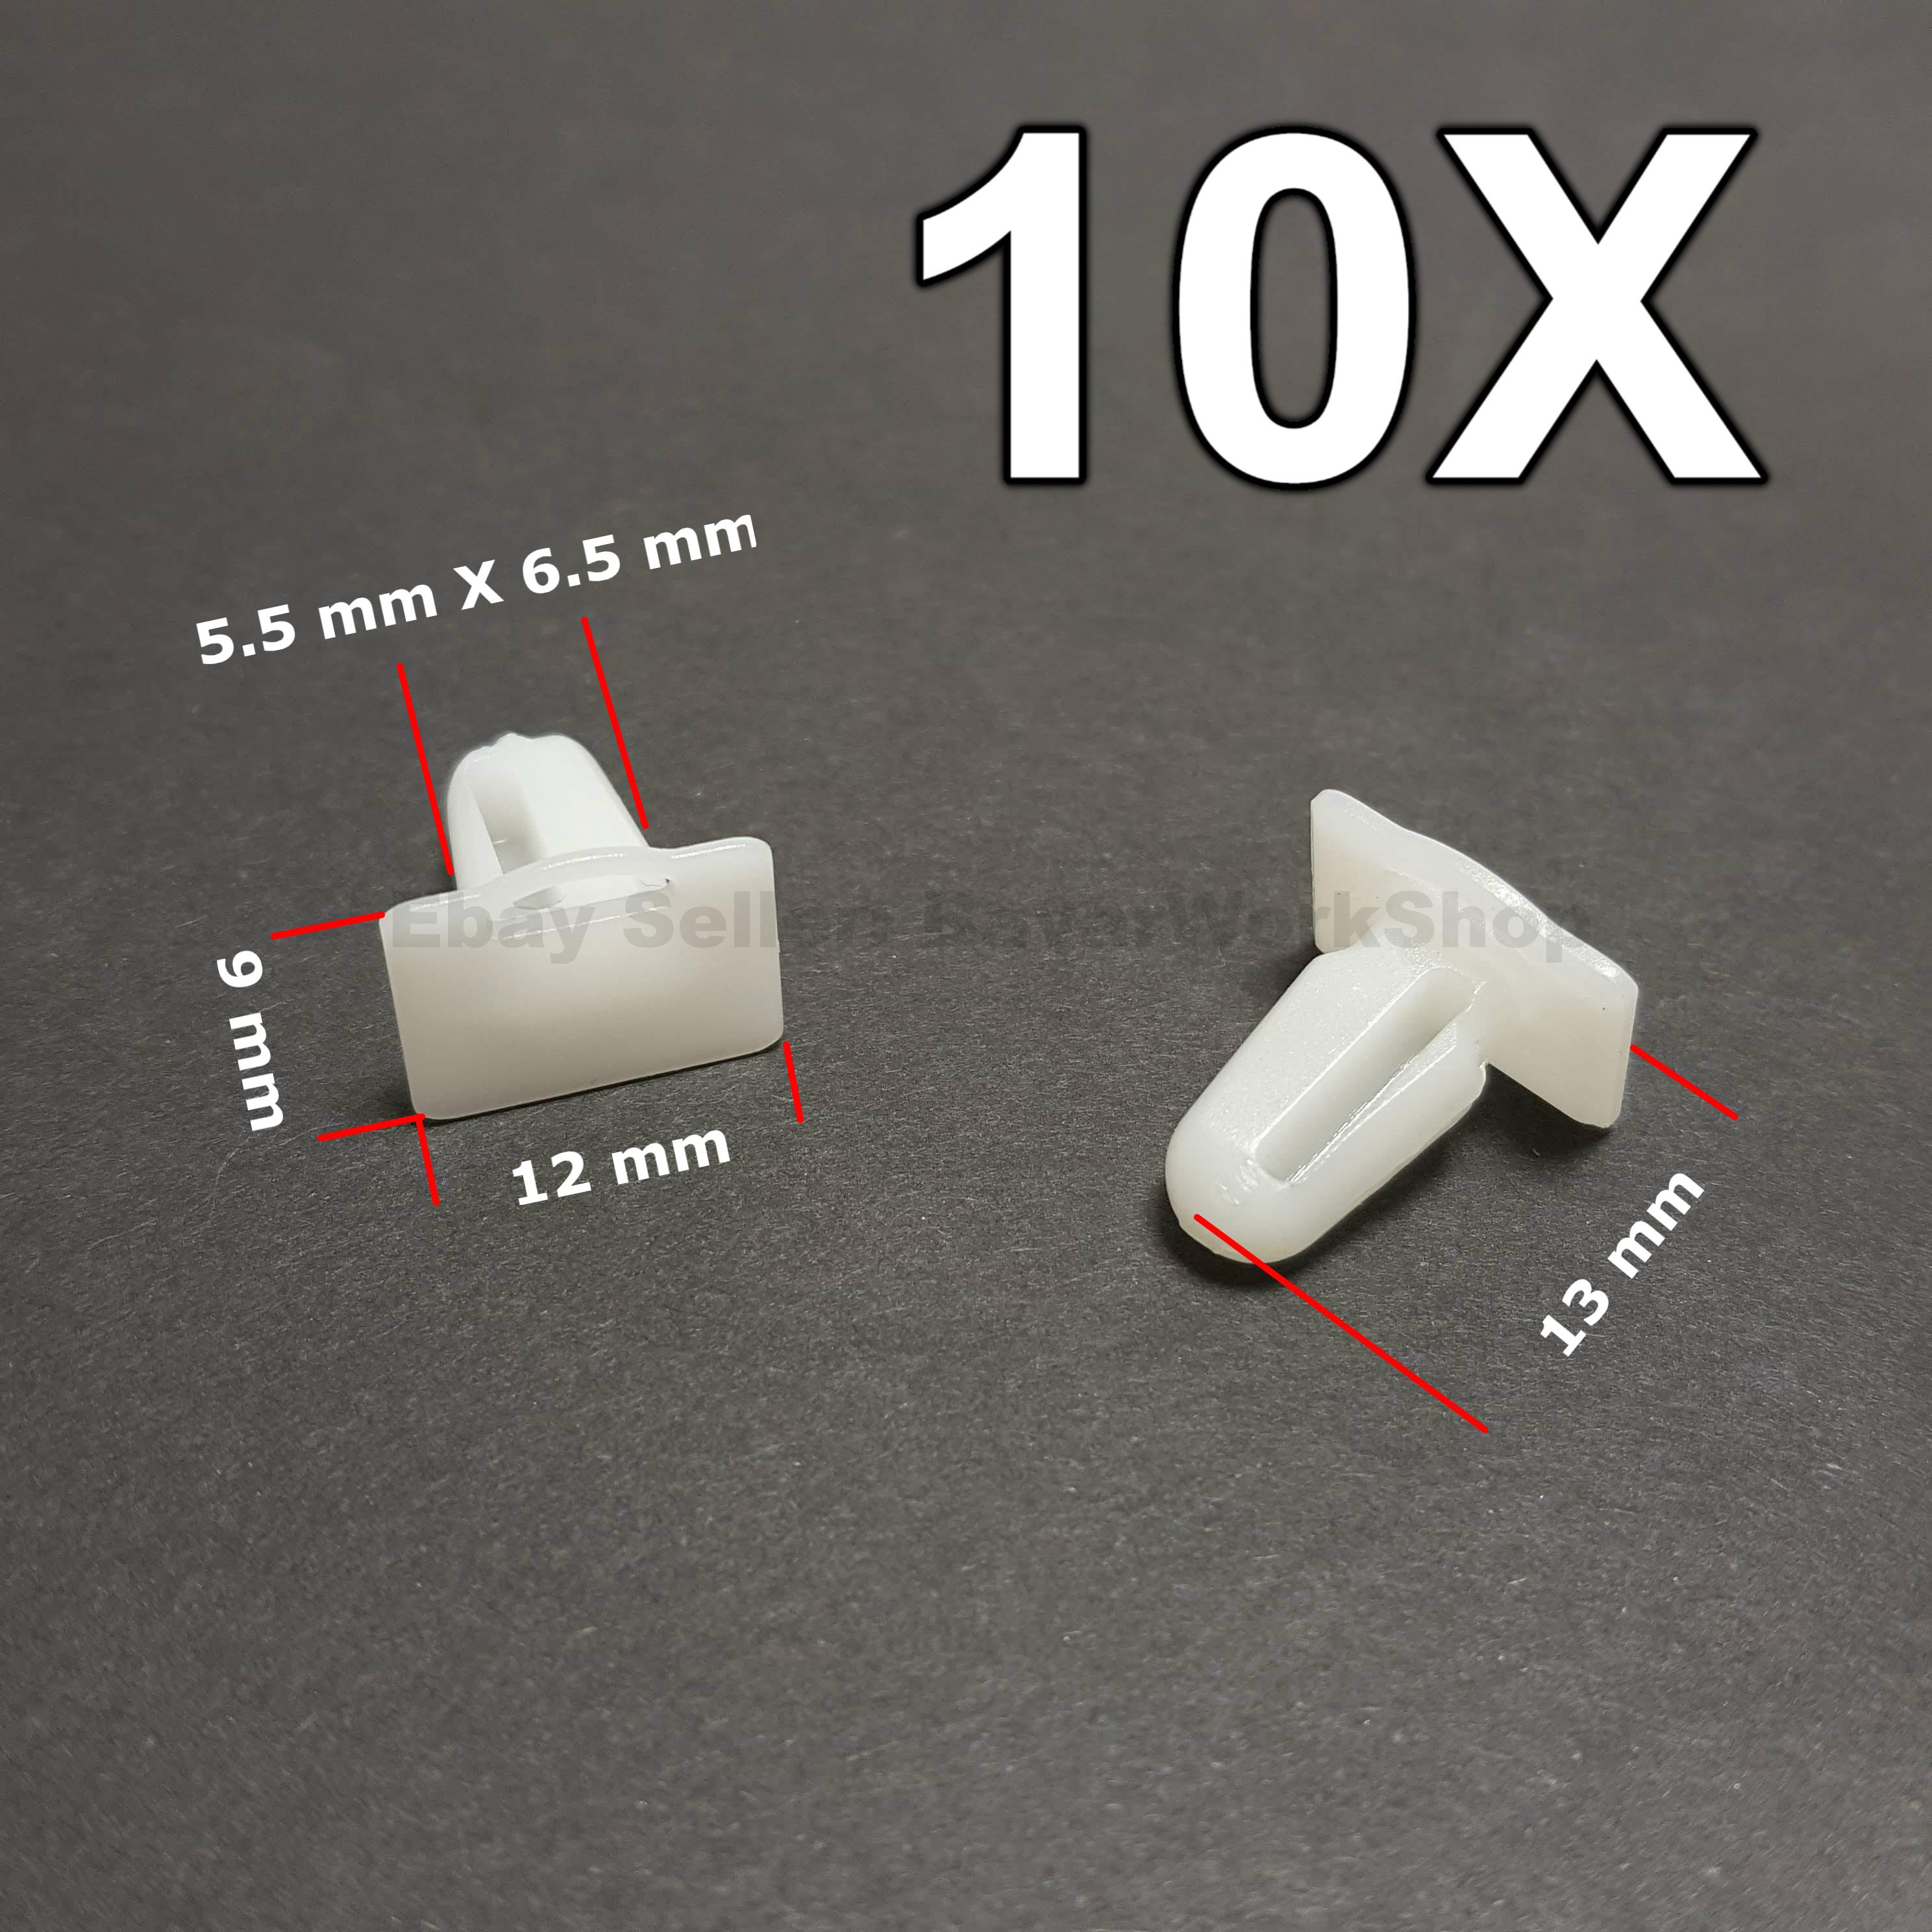 10x Clips Door Sill Edge Protection Door Threshold for BMW 51471840960